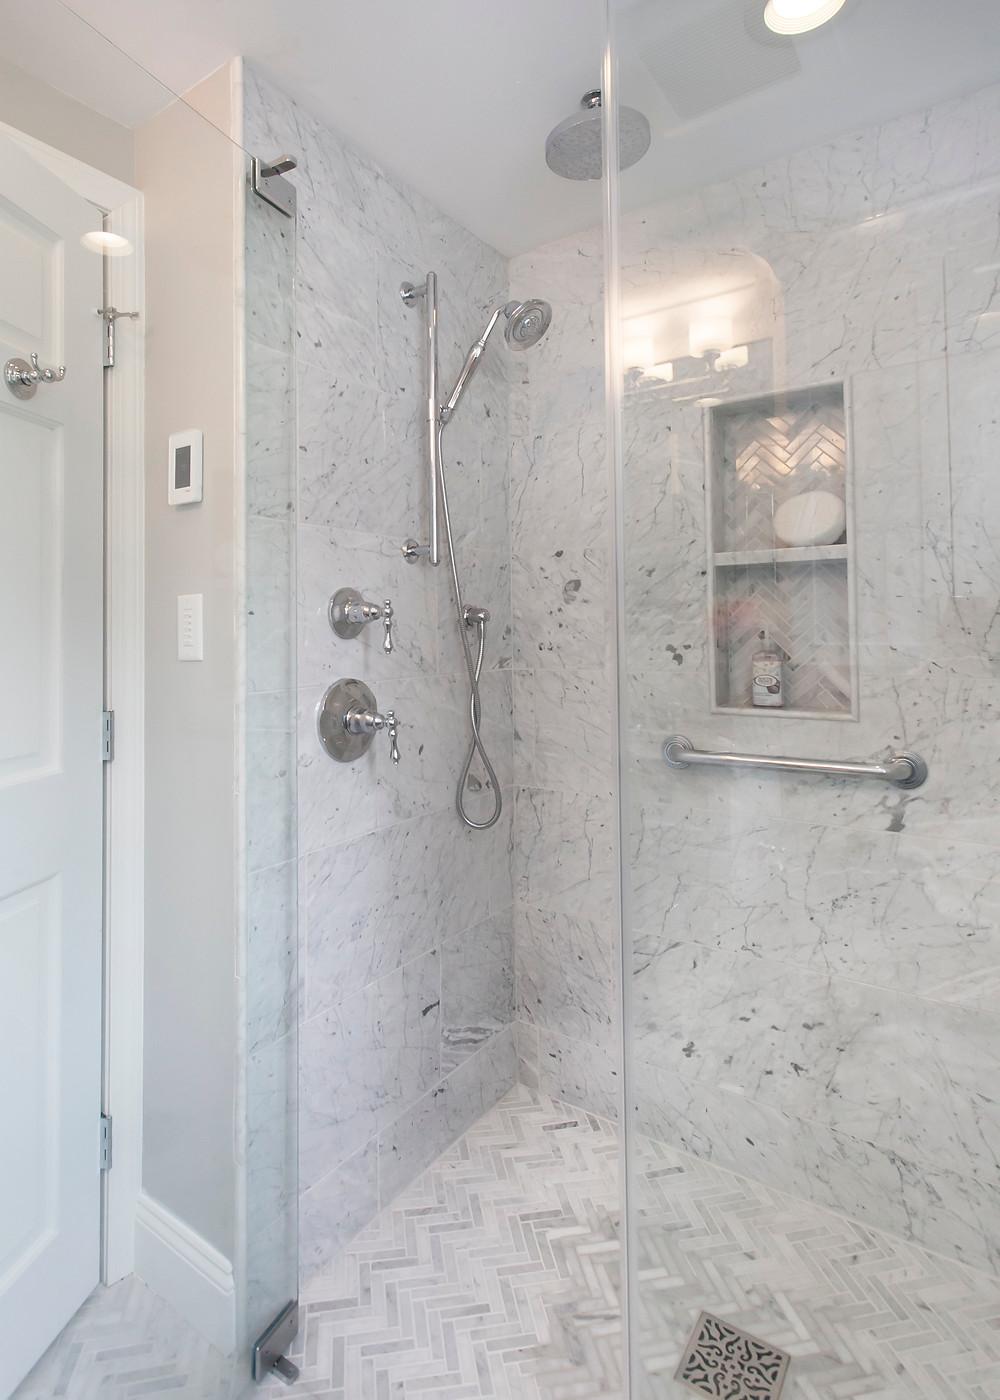 Curbless shower with herringbone marble floor